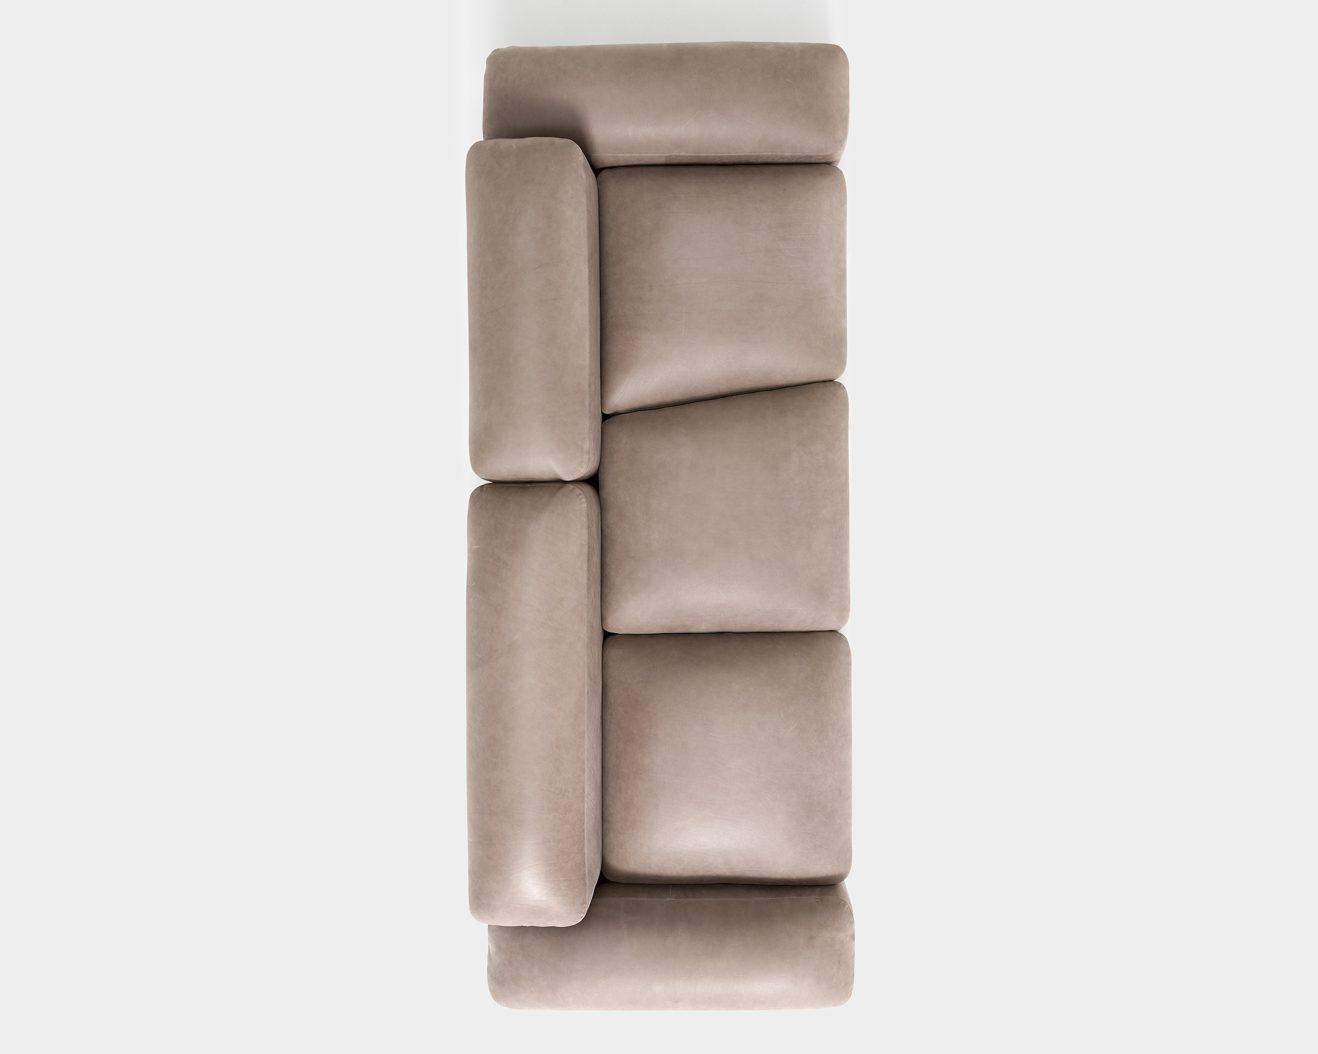 Lapis-sofa-amuralab-emanuel-gargano-2-2